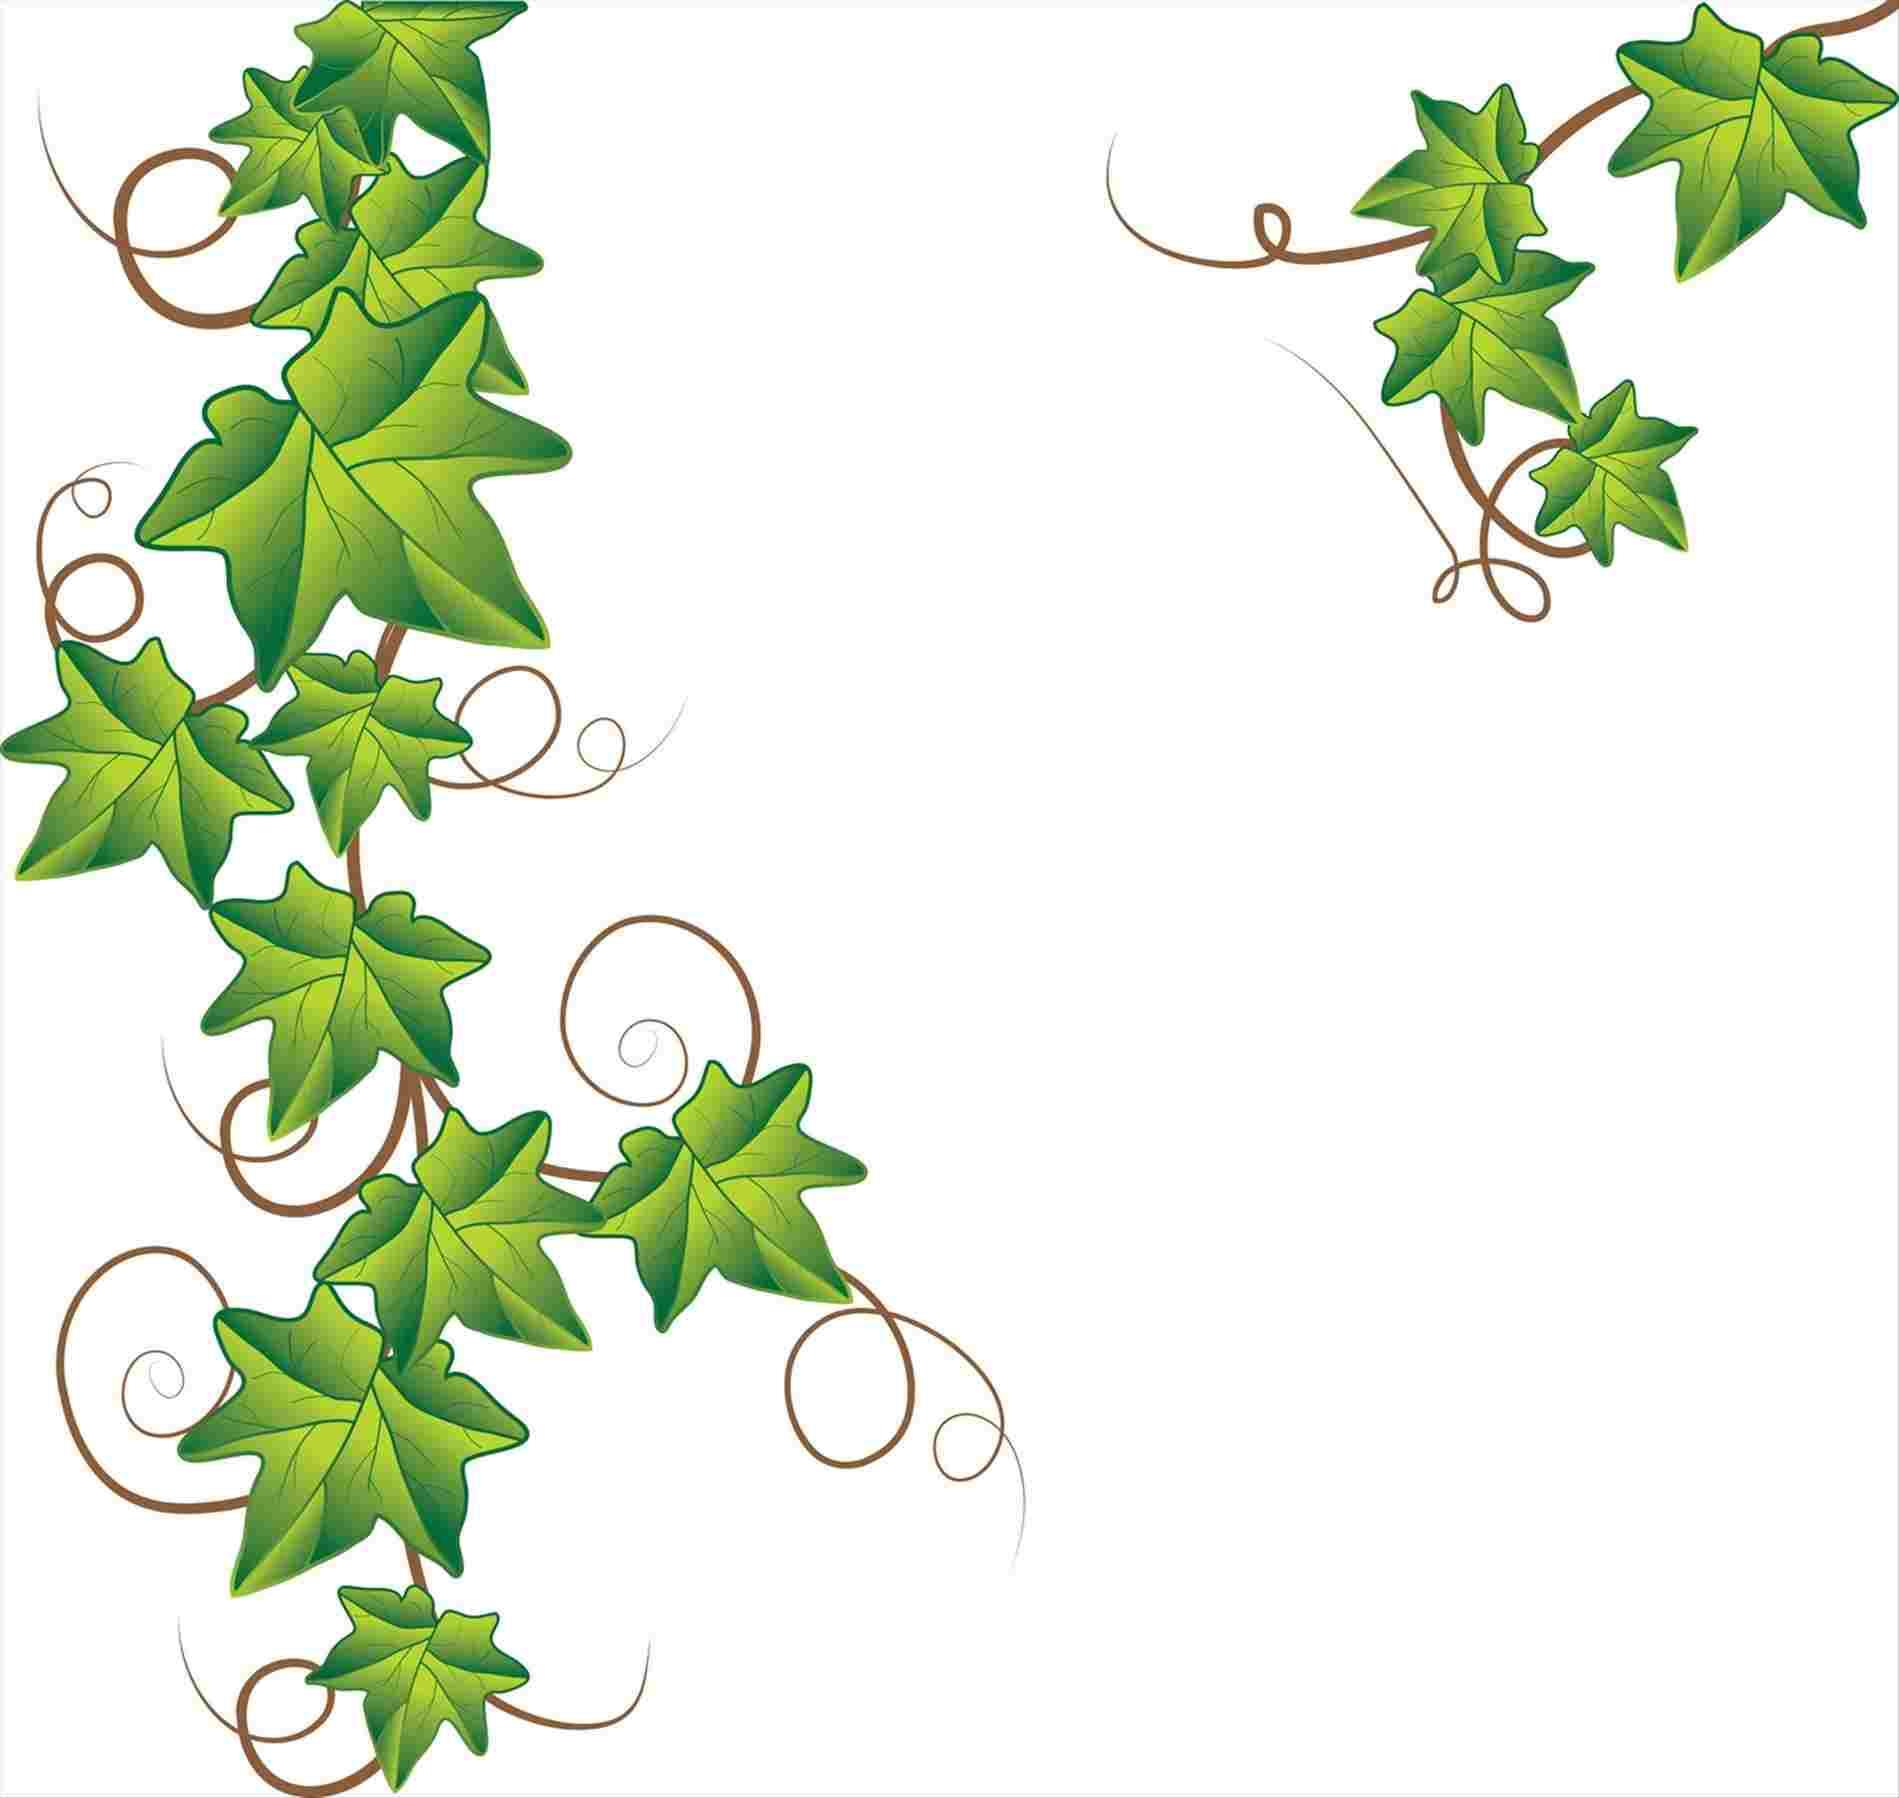 1899x1798 Vine Cute Ivy Leaf Drawing Tattoo Designs Image Vector Clip Art